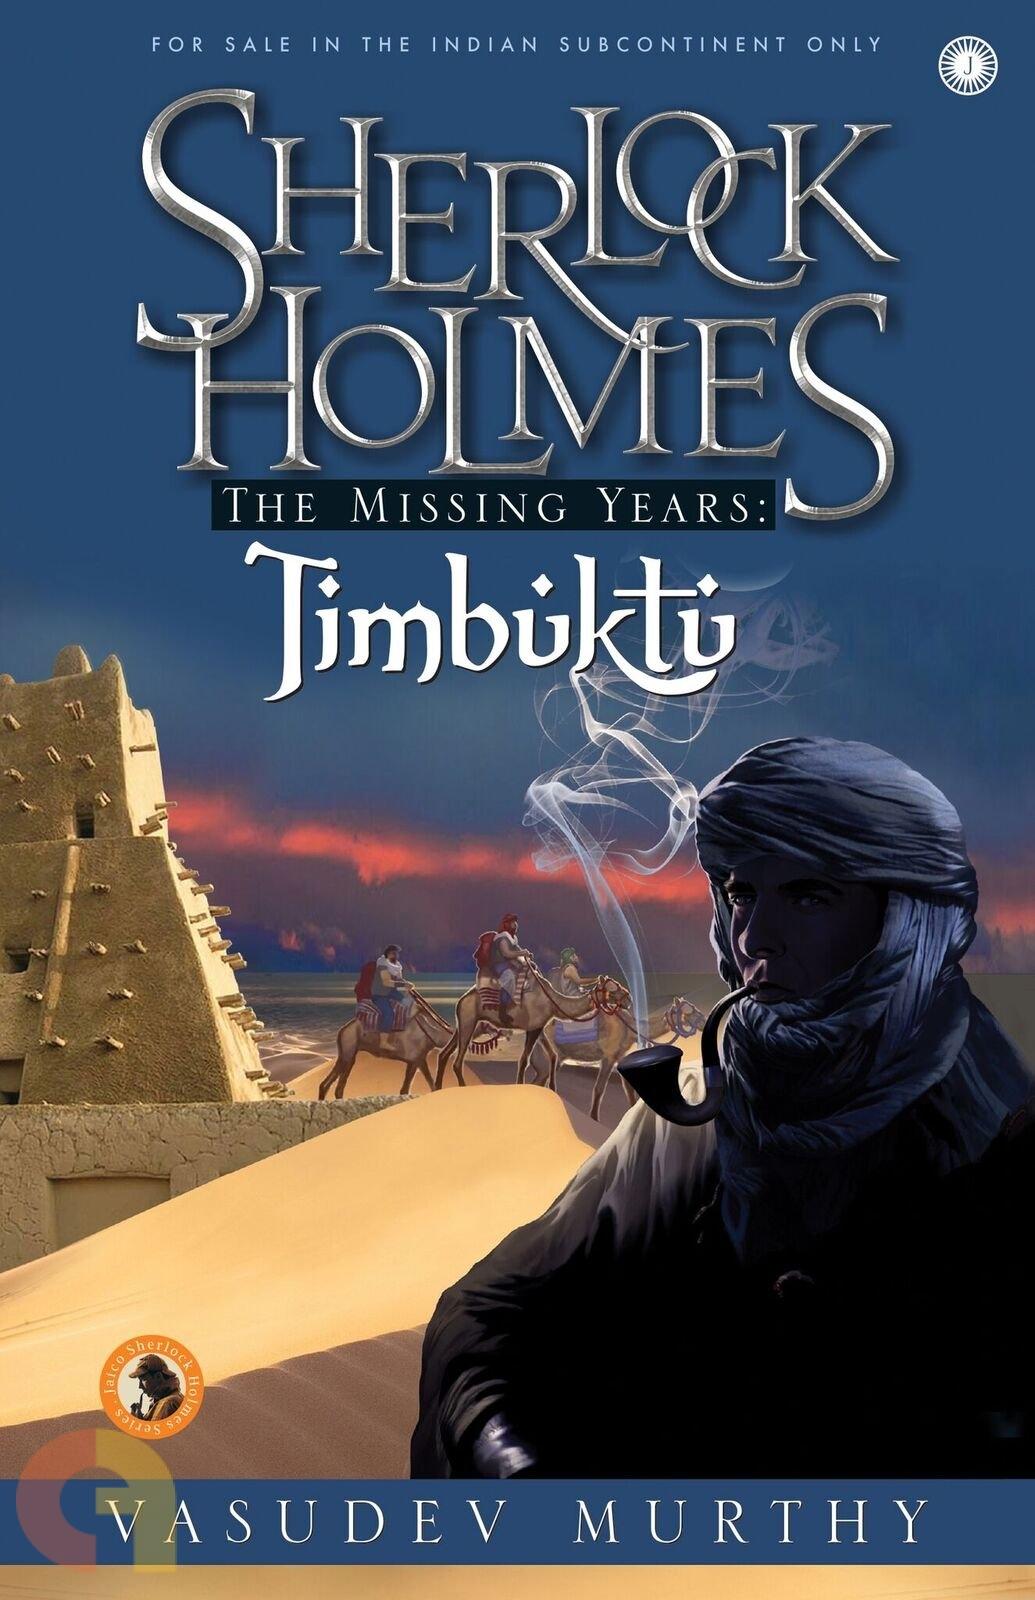 Sherlock Holmes The Missing Years: Timbuktu